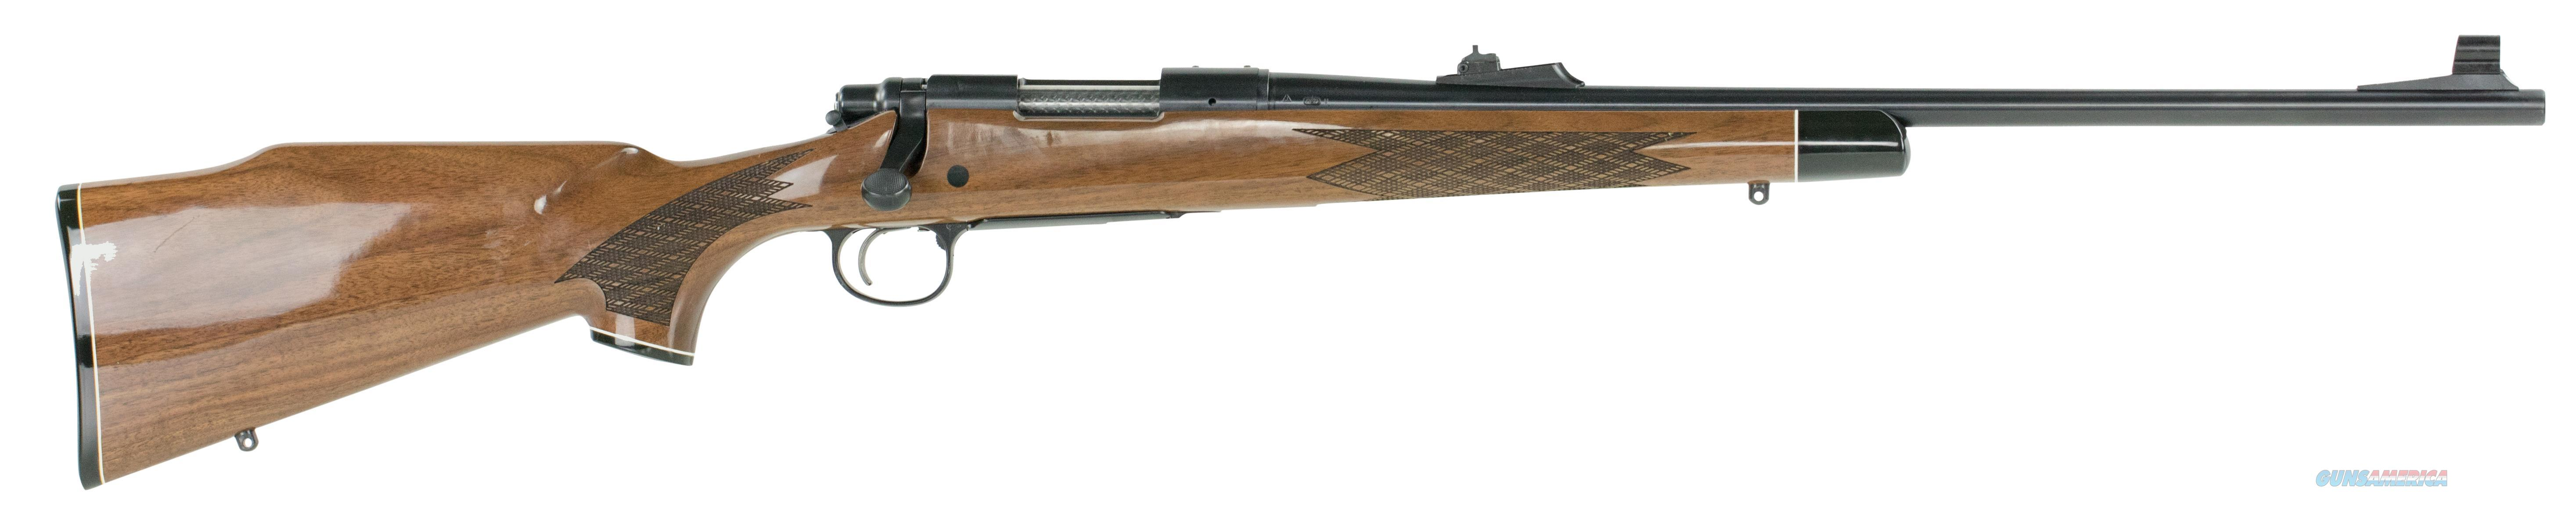 "Remington Firearms 25787 700 Bdl Bolt 243 Winchester 22"" 4+1 American Walnut Stk Blued 25787  Guns > Rifles > R Misc Rifles"